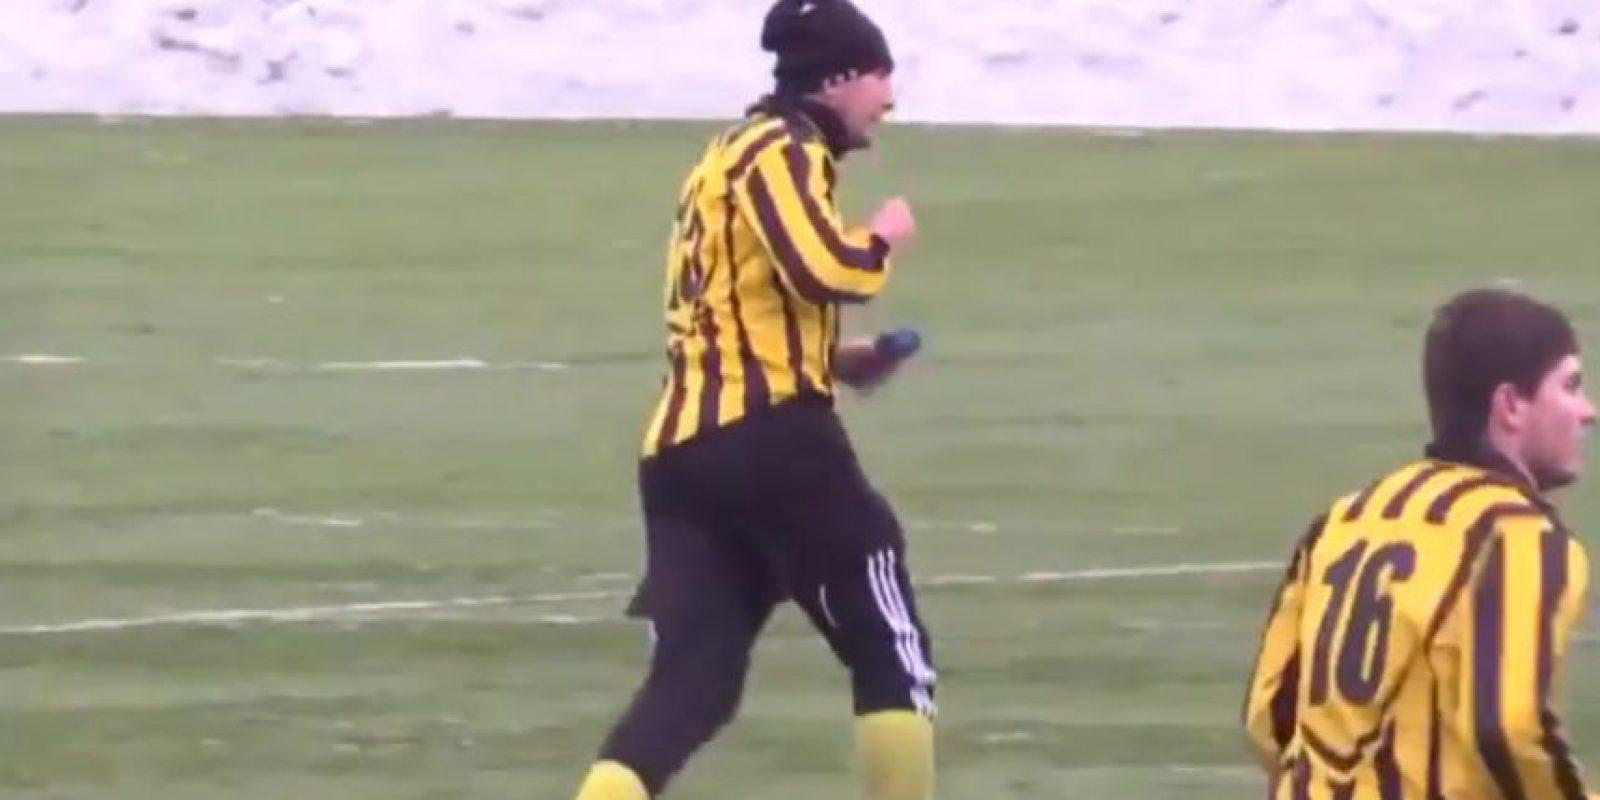 Su equipo superó 2-1 al Olimpik Donetsk Foto:Youtube: 101greatgoalsFan2